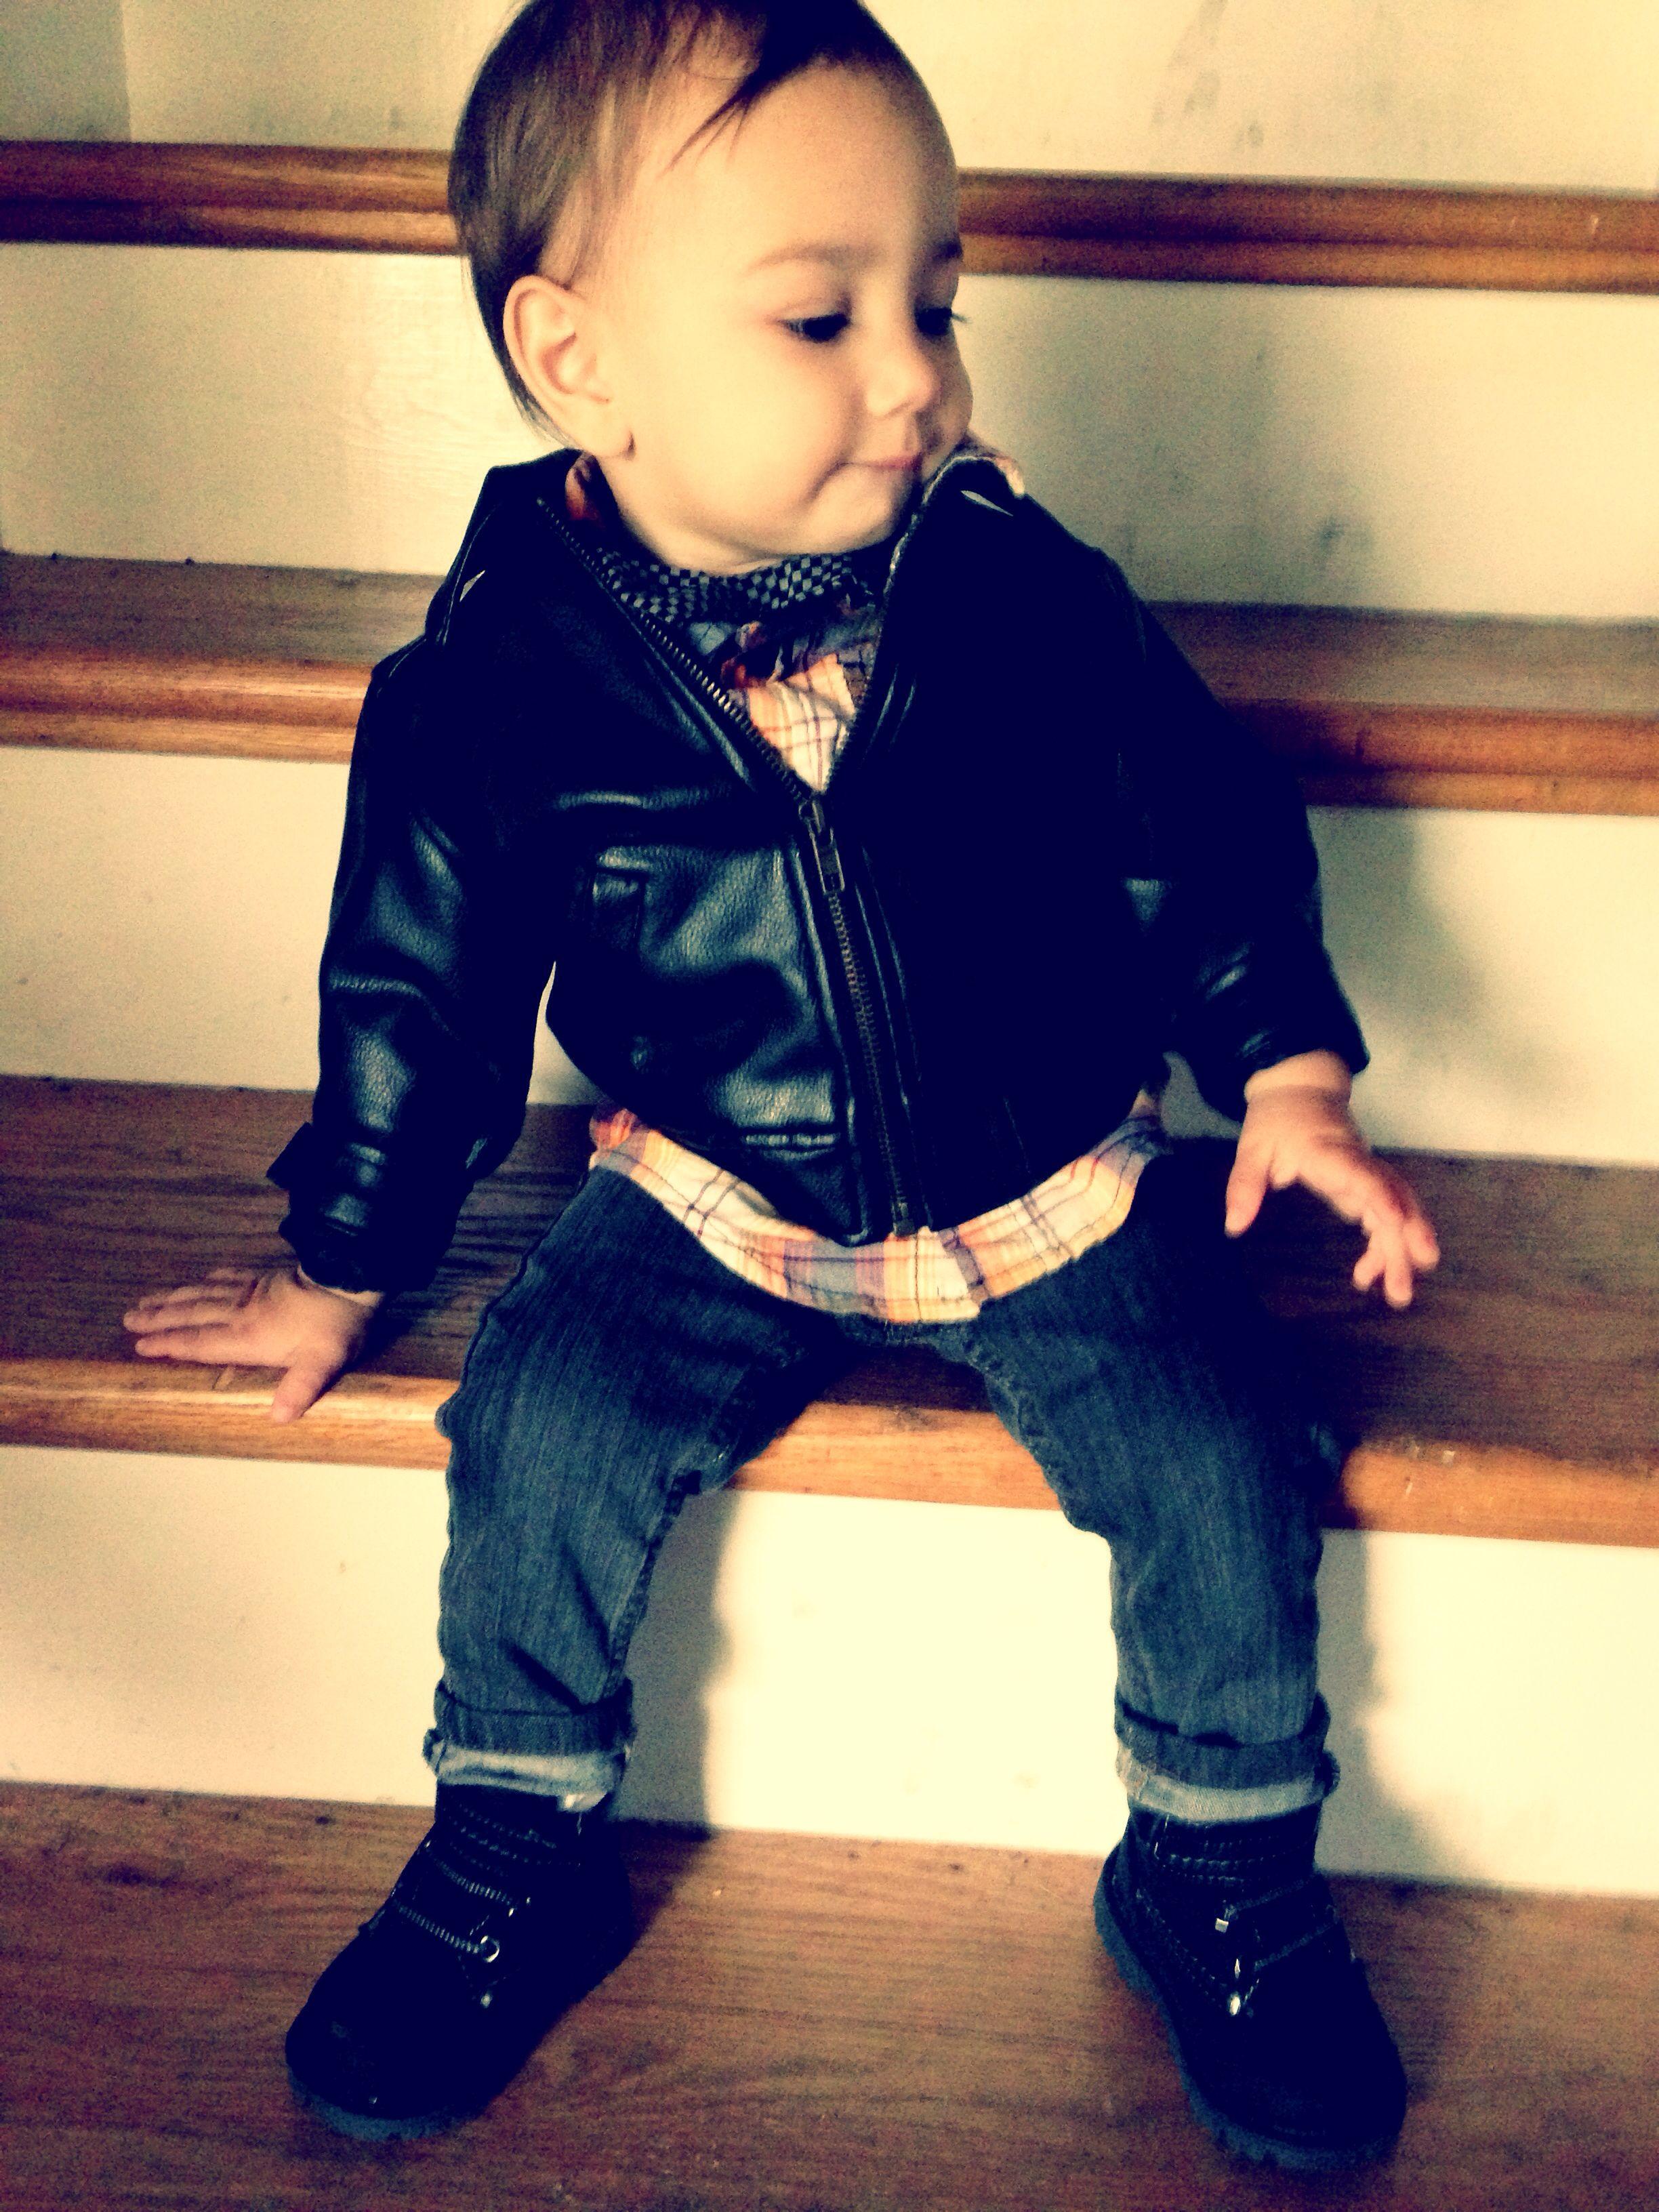 Leather Jacket Atticusbean Baby Fashion Leather Jacket Boys Closet [ 3264 x 2448 Pixel ]